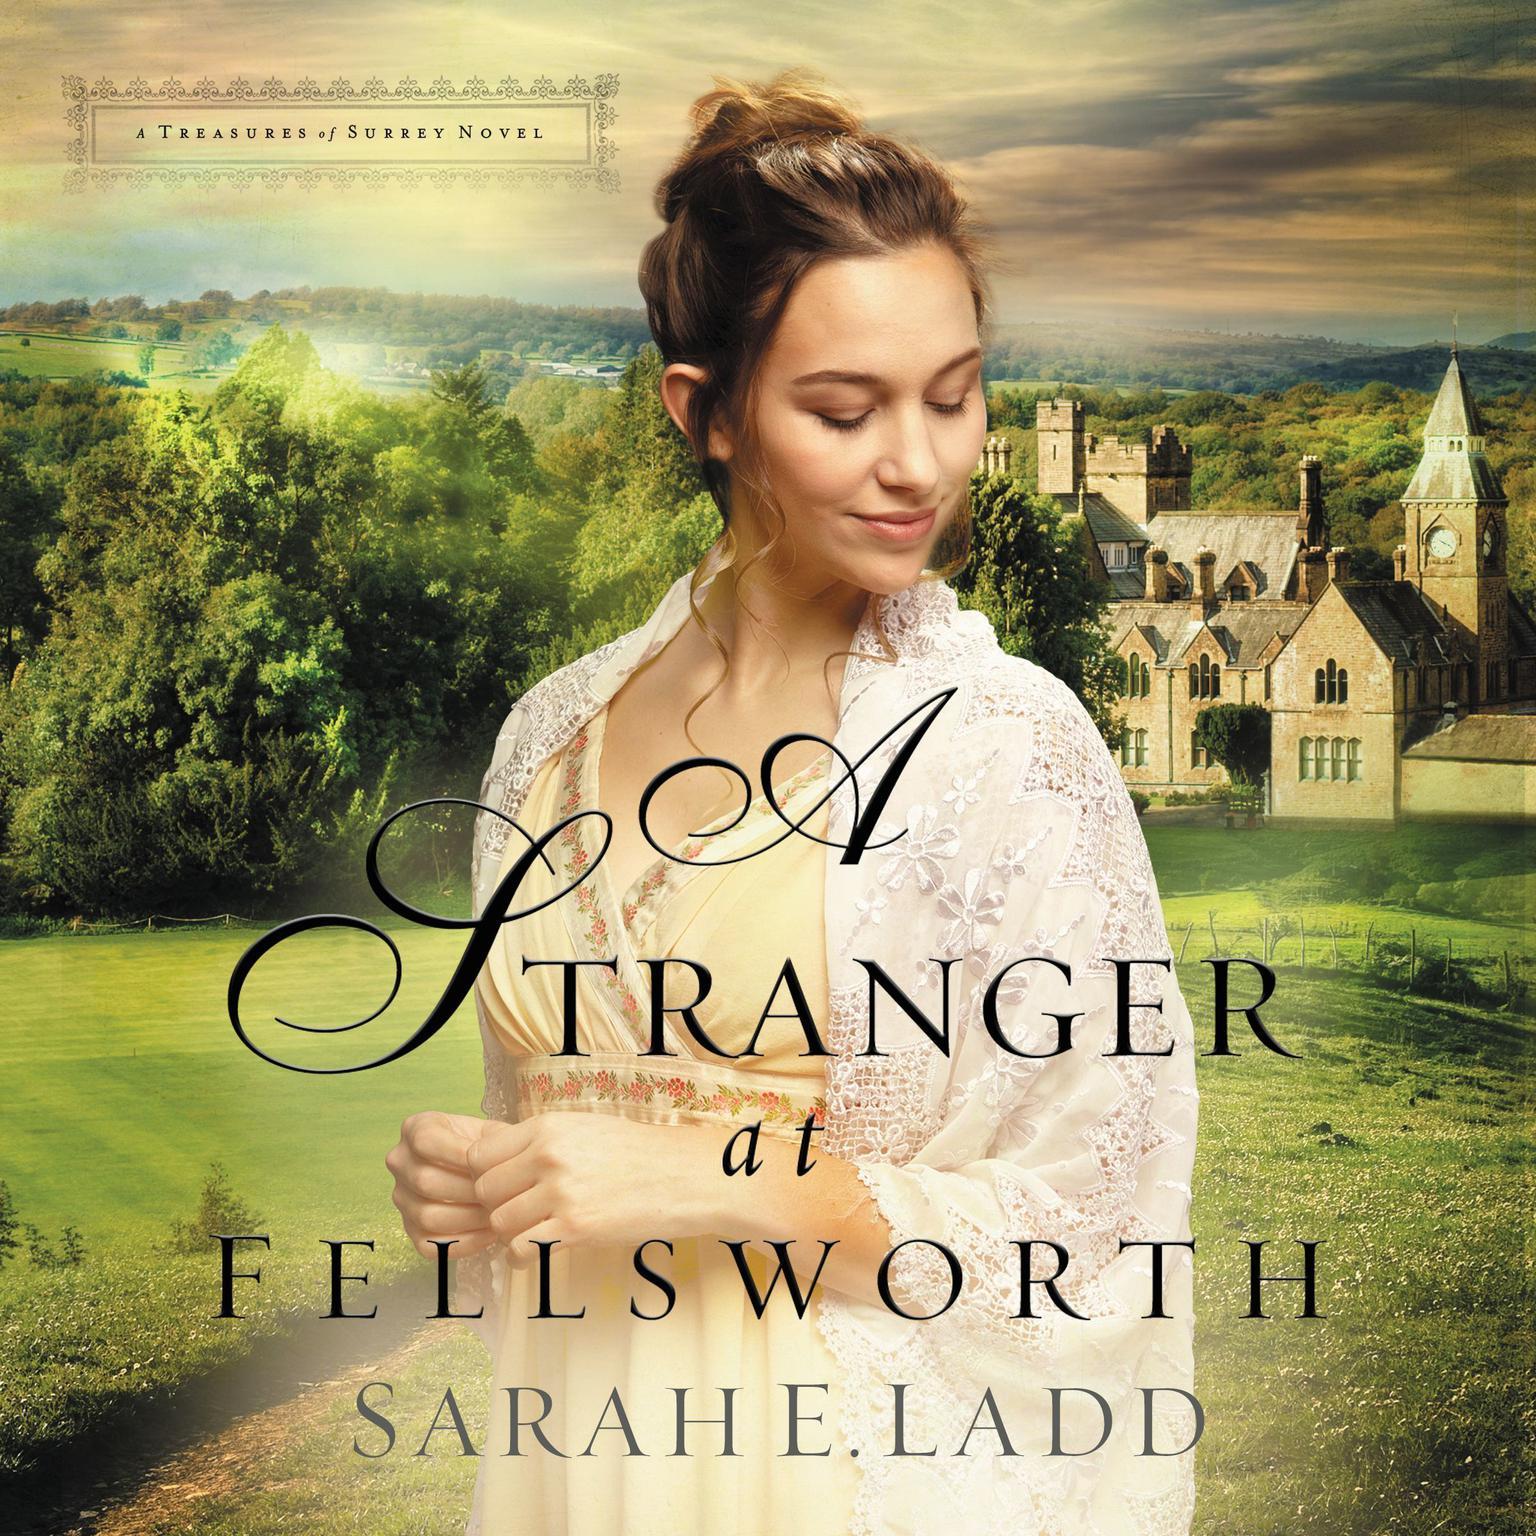 A Stranger at Fellsworth Audiobook, by Sarah E. Ladd